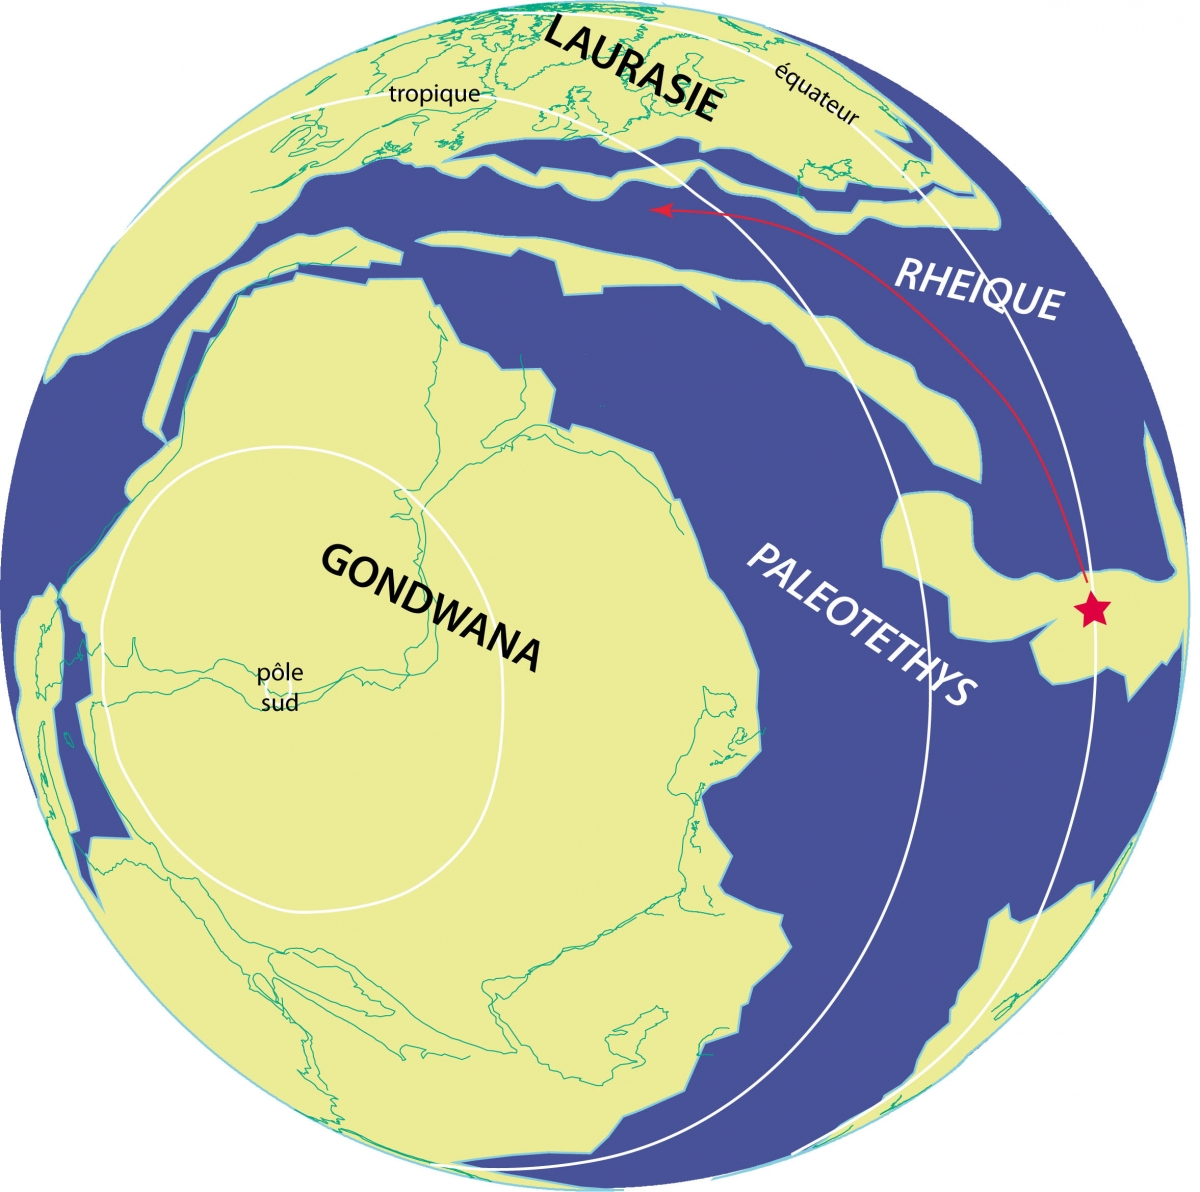 le gondwana